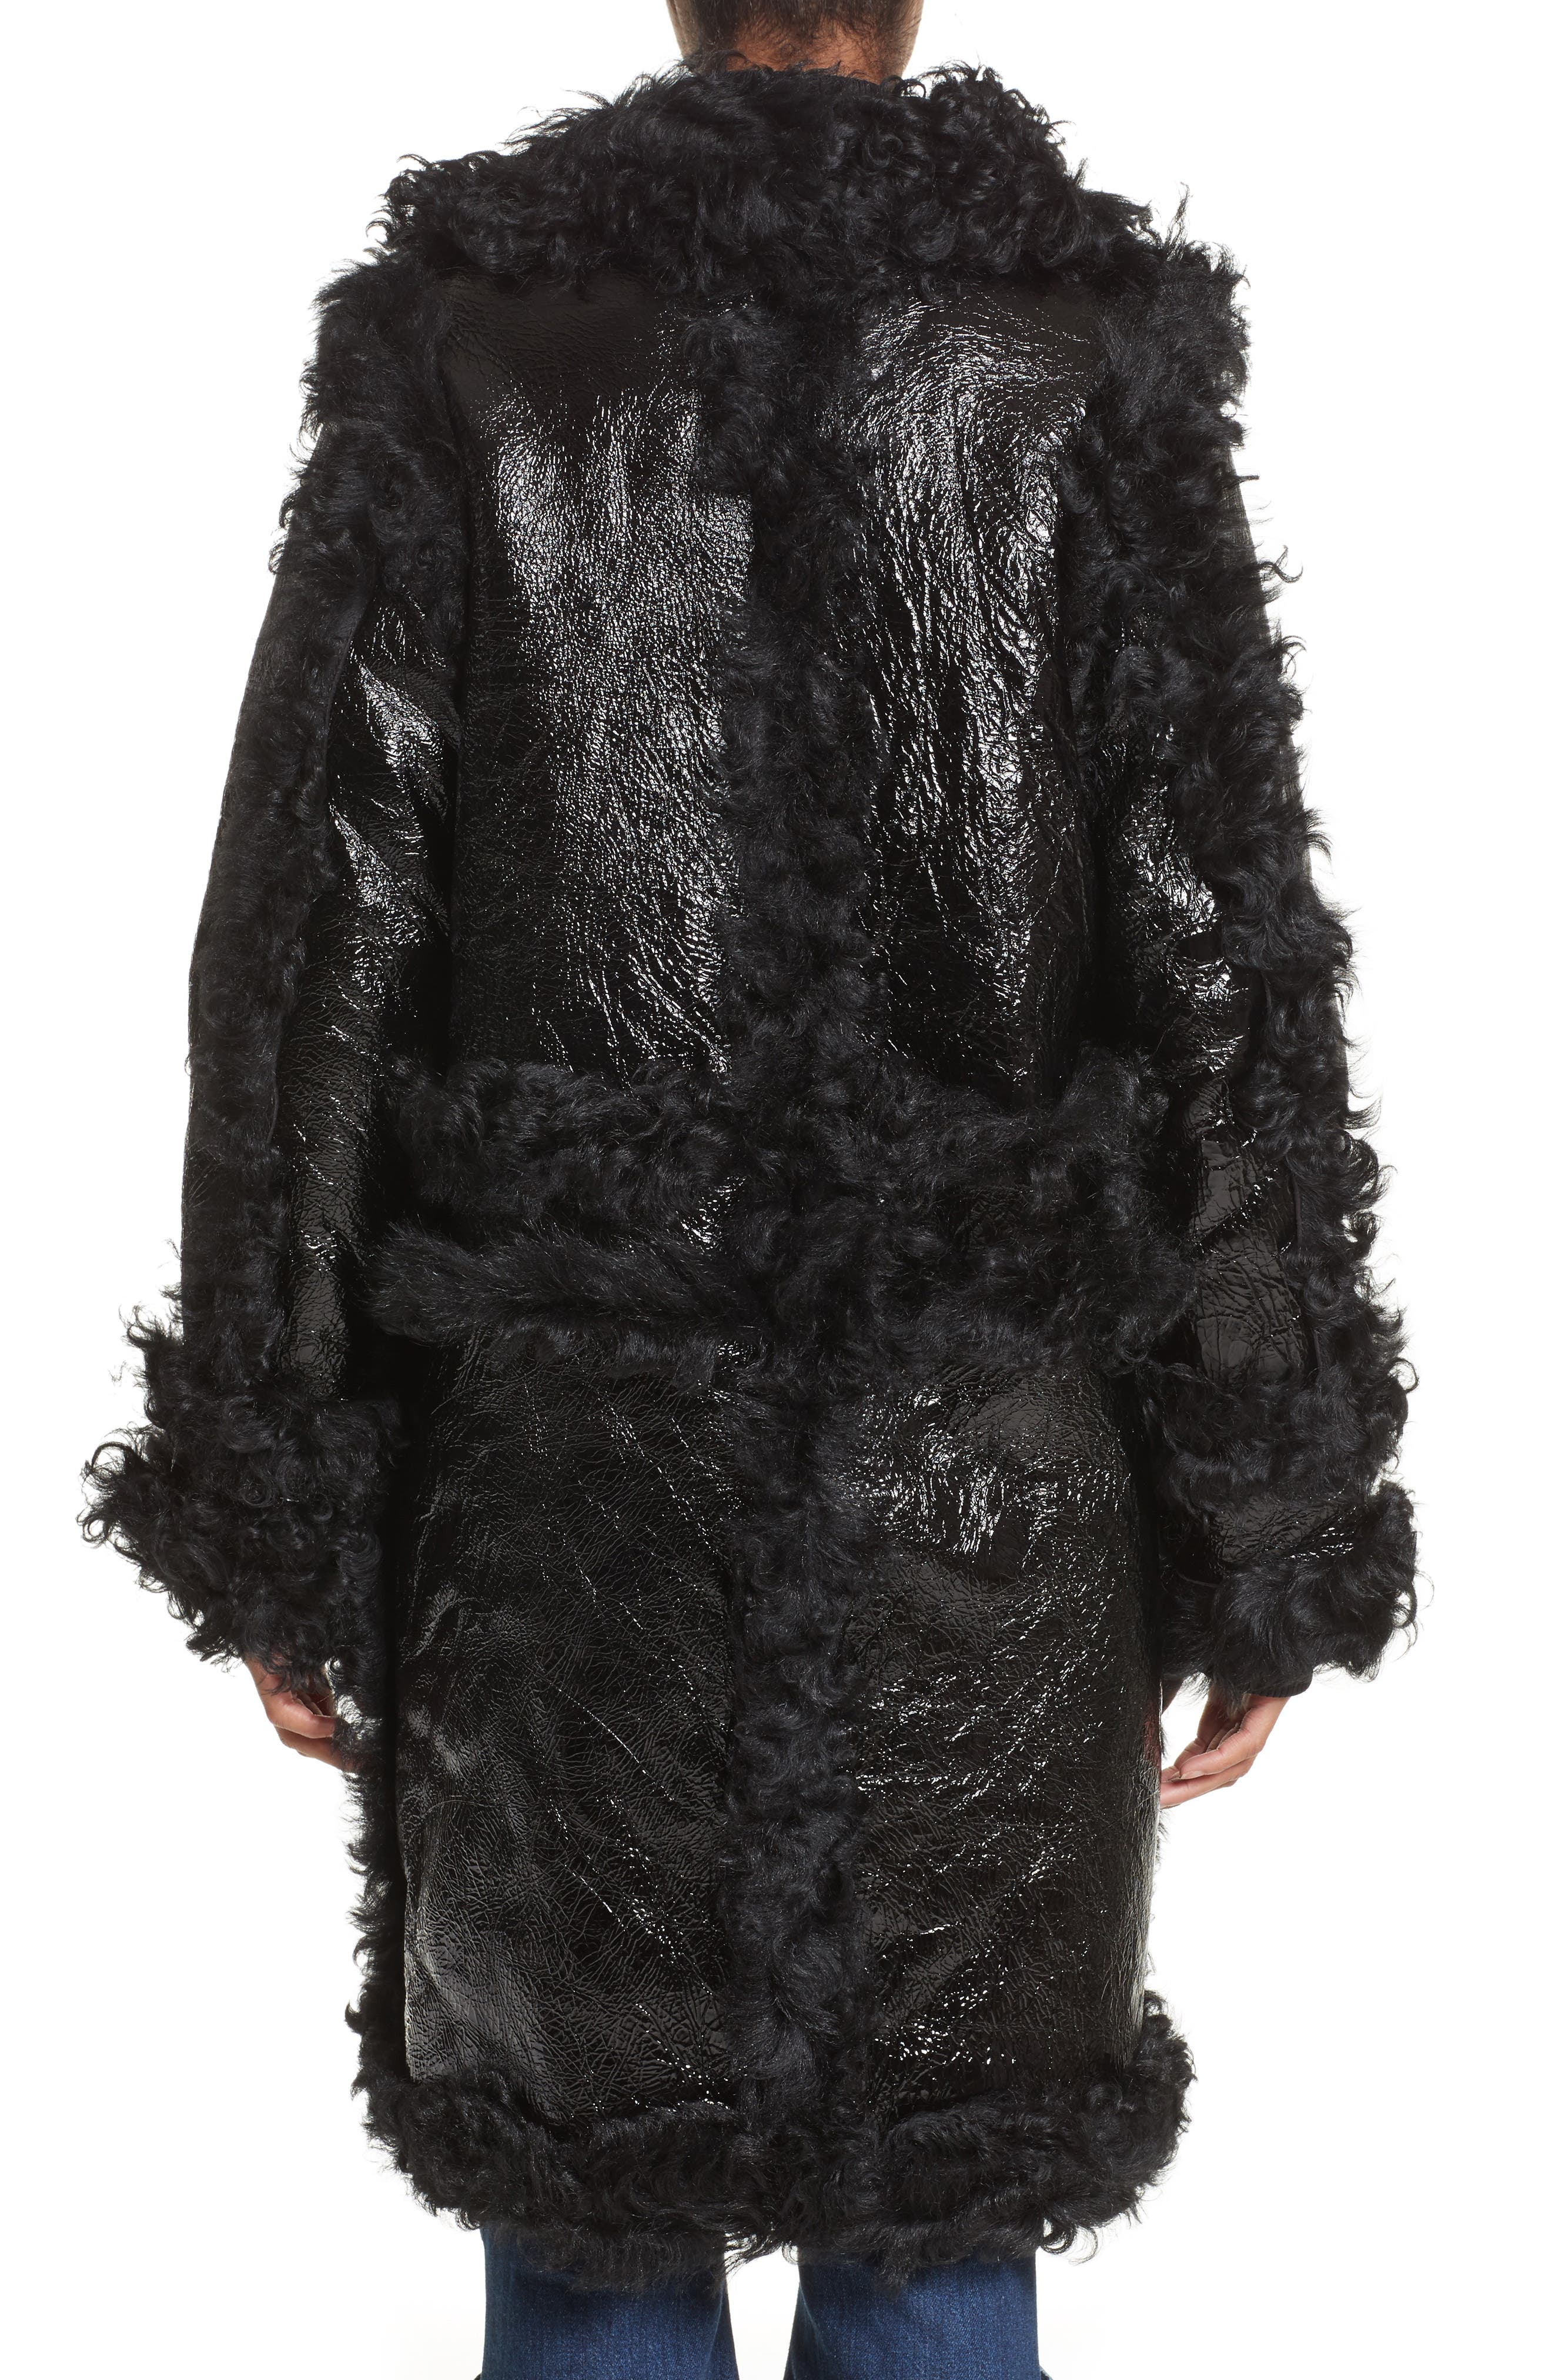 Marques'Almeida Foiled Genuine Shearling Coat,                             Alternate thumbnail 2, color,                             001